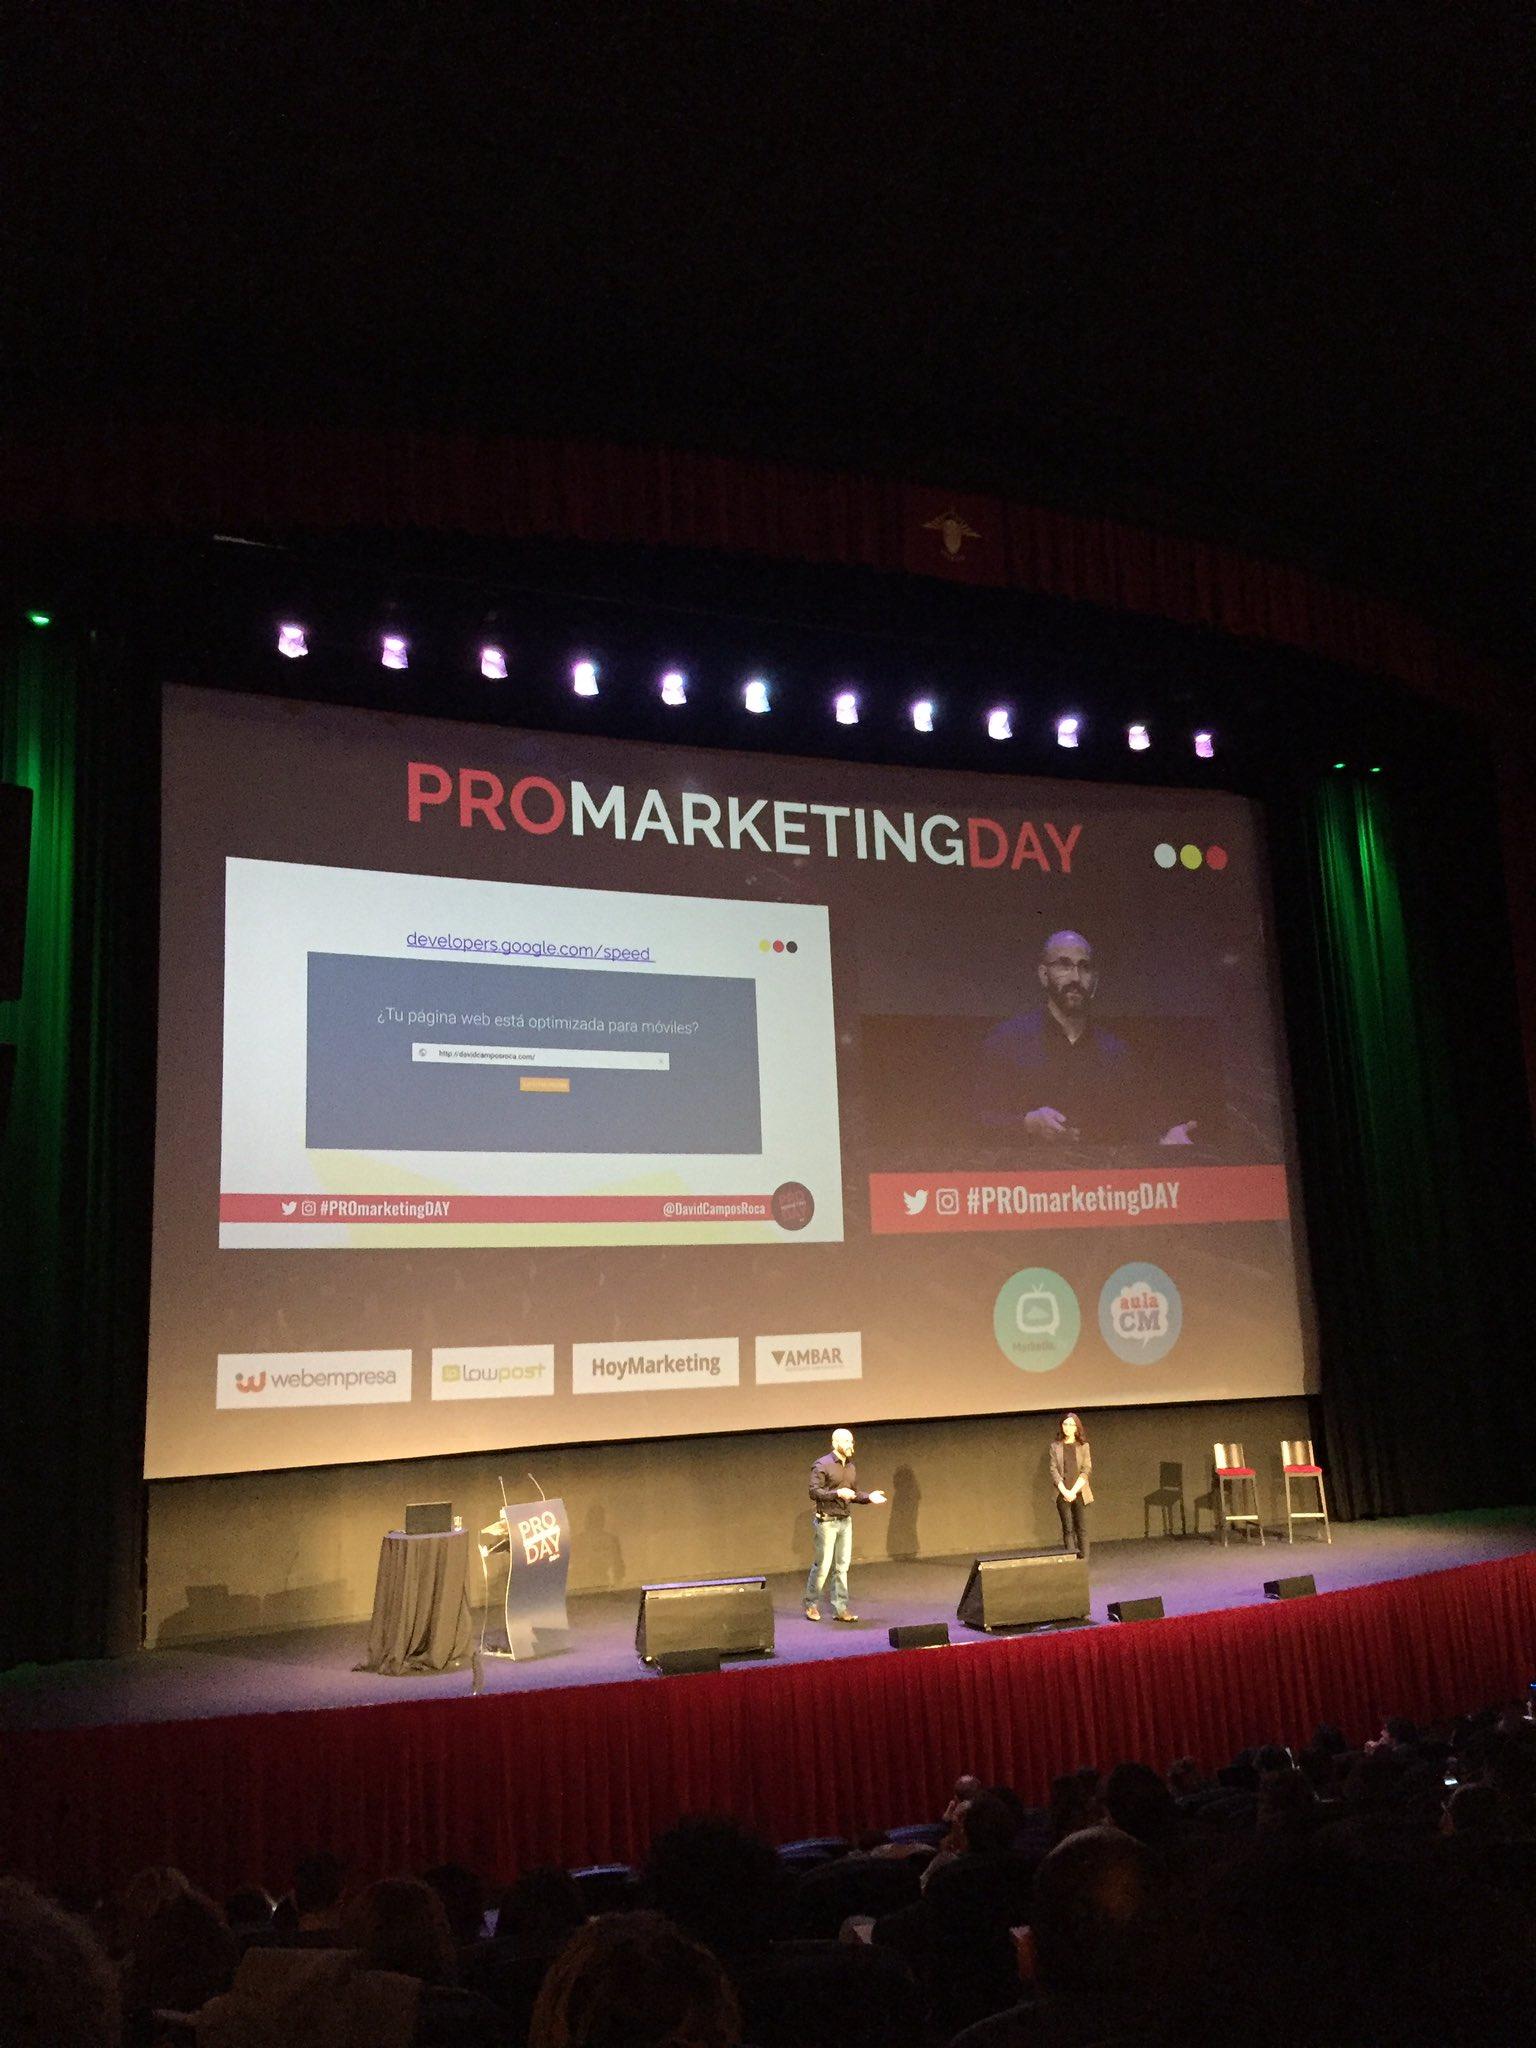 ¿Sabes si tu web está optimizada para dispositivos móviles? 📲 @DavidCamposRoca nos habla de #Googledevelopers en #ProMarketingDay https://t.co/dJ4iBWdnsT